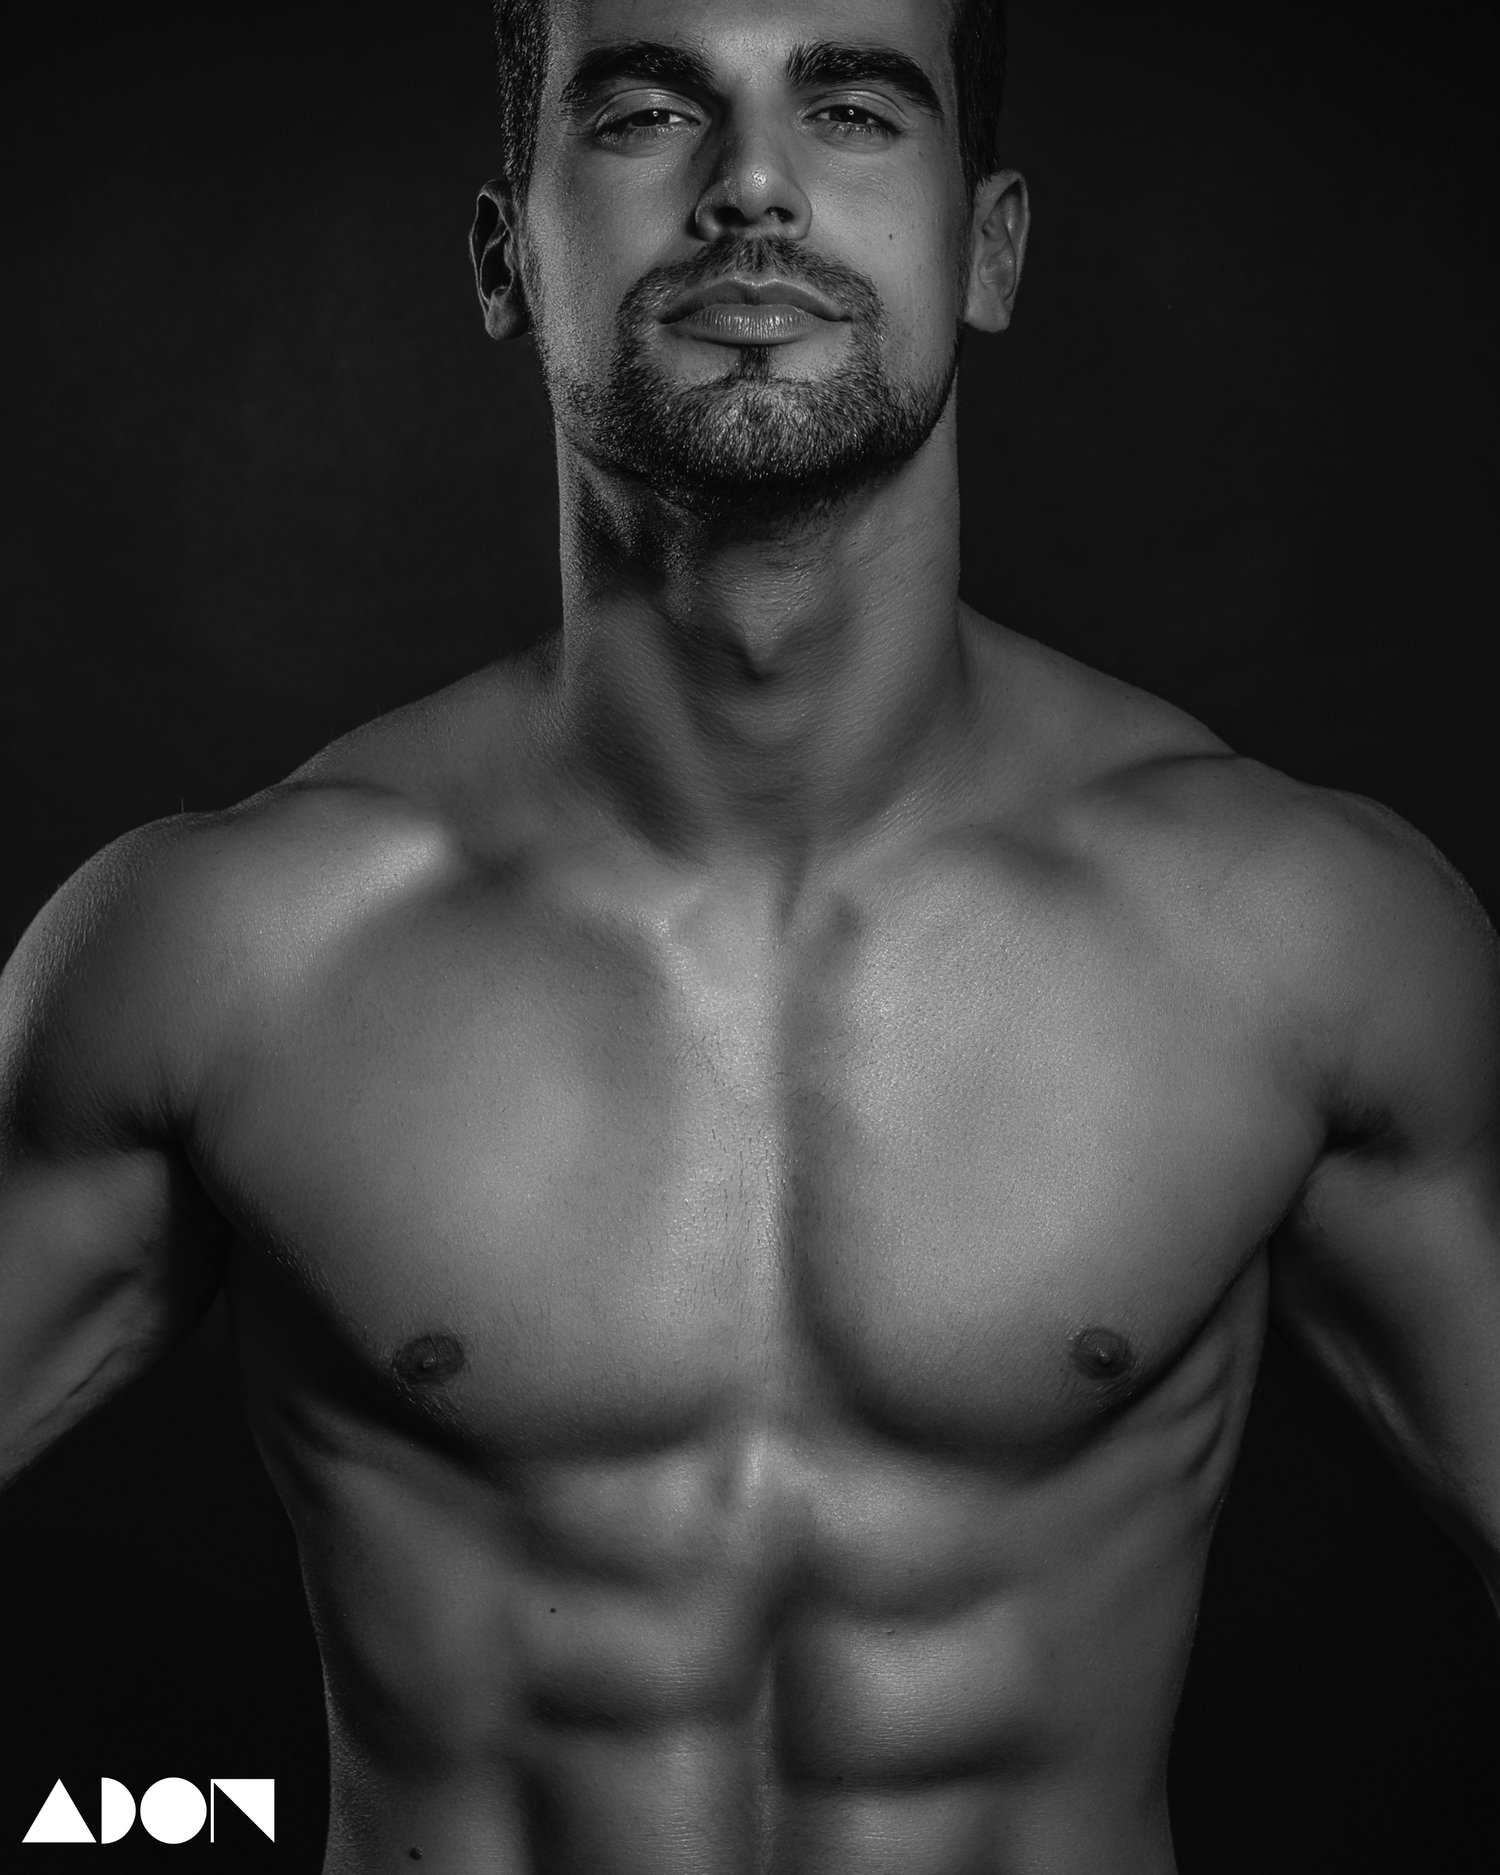 Adon Exclusive: Model Steven Caraton-aires By Alain Bearinz